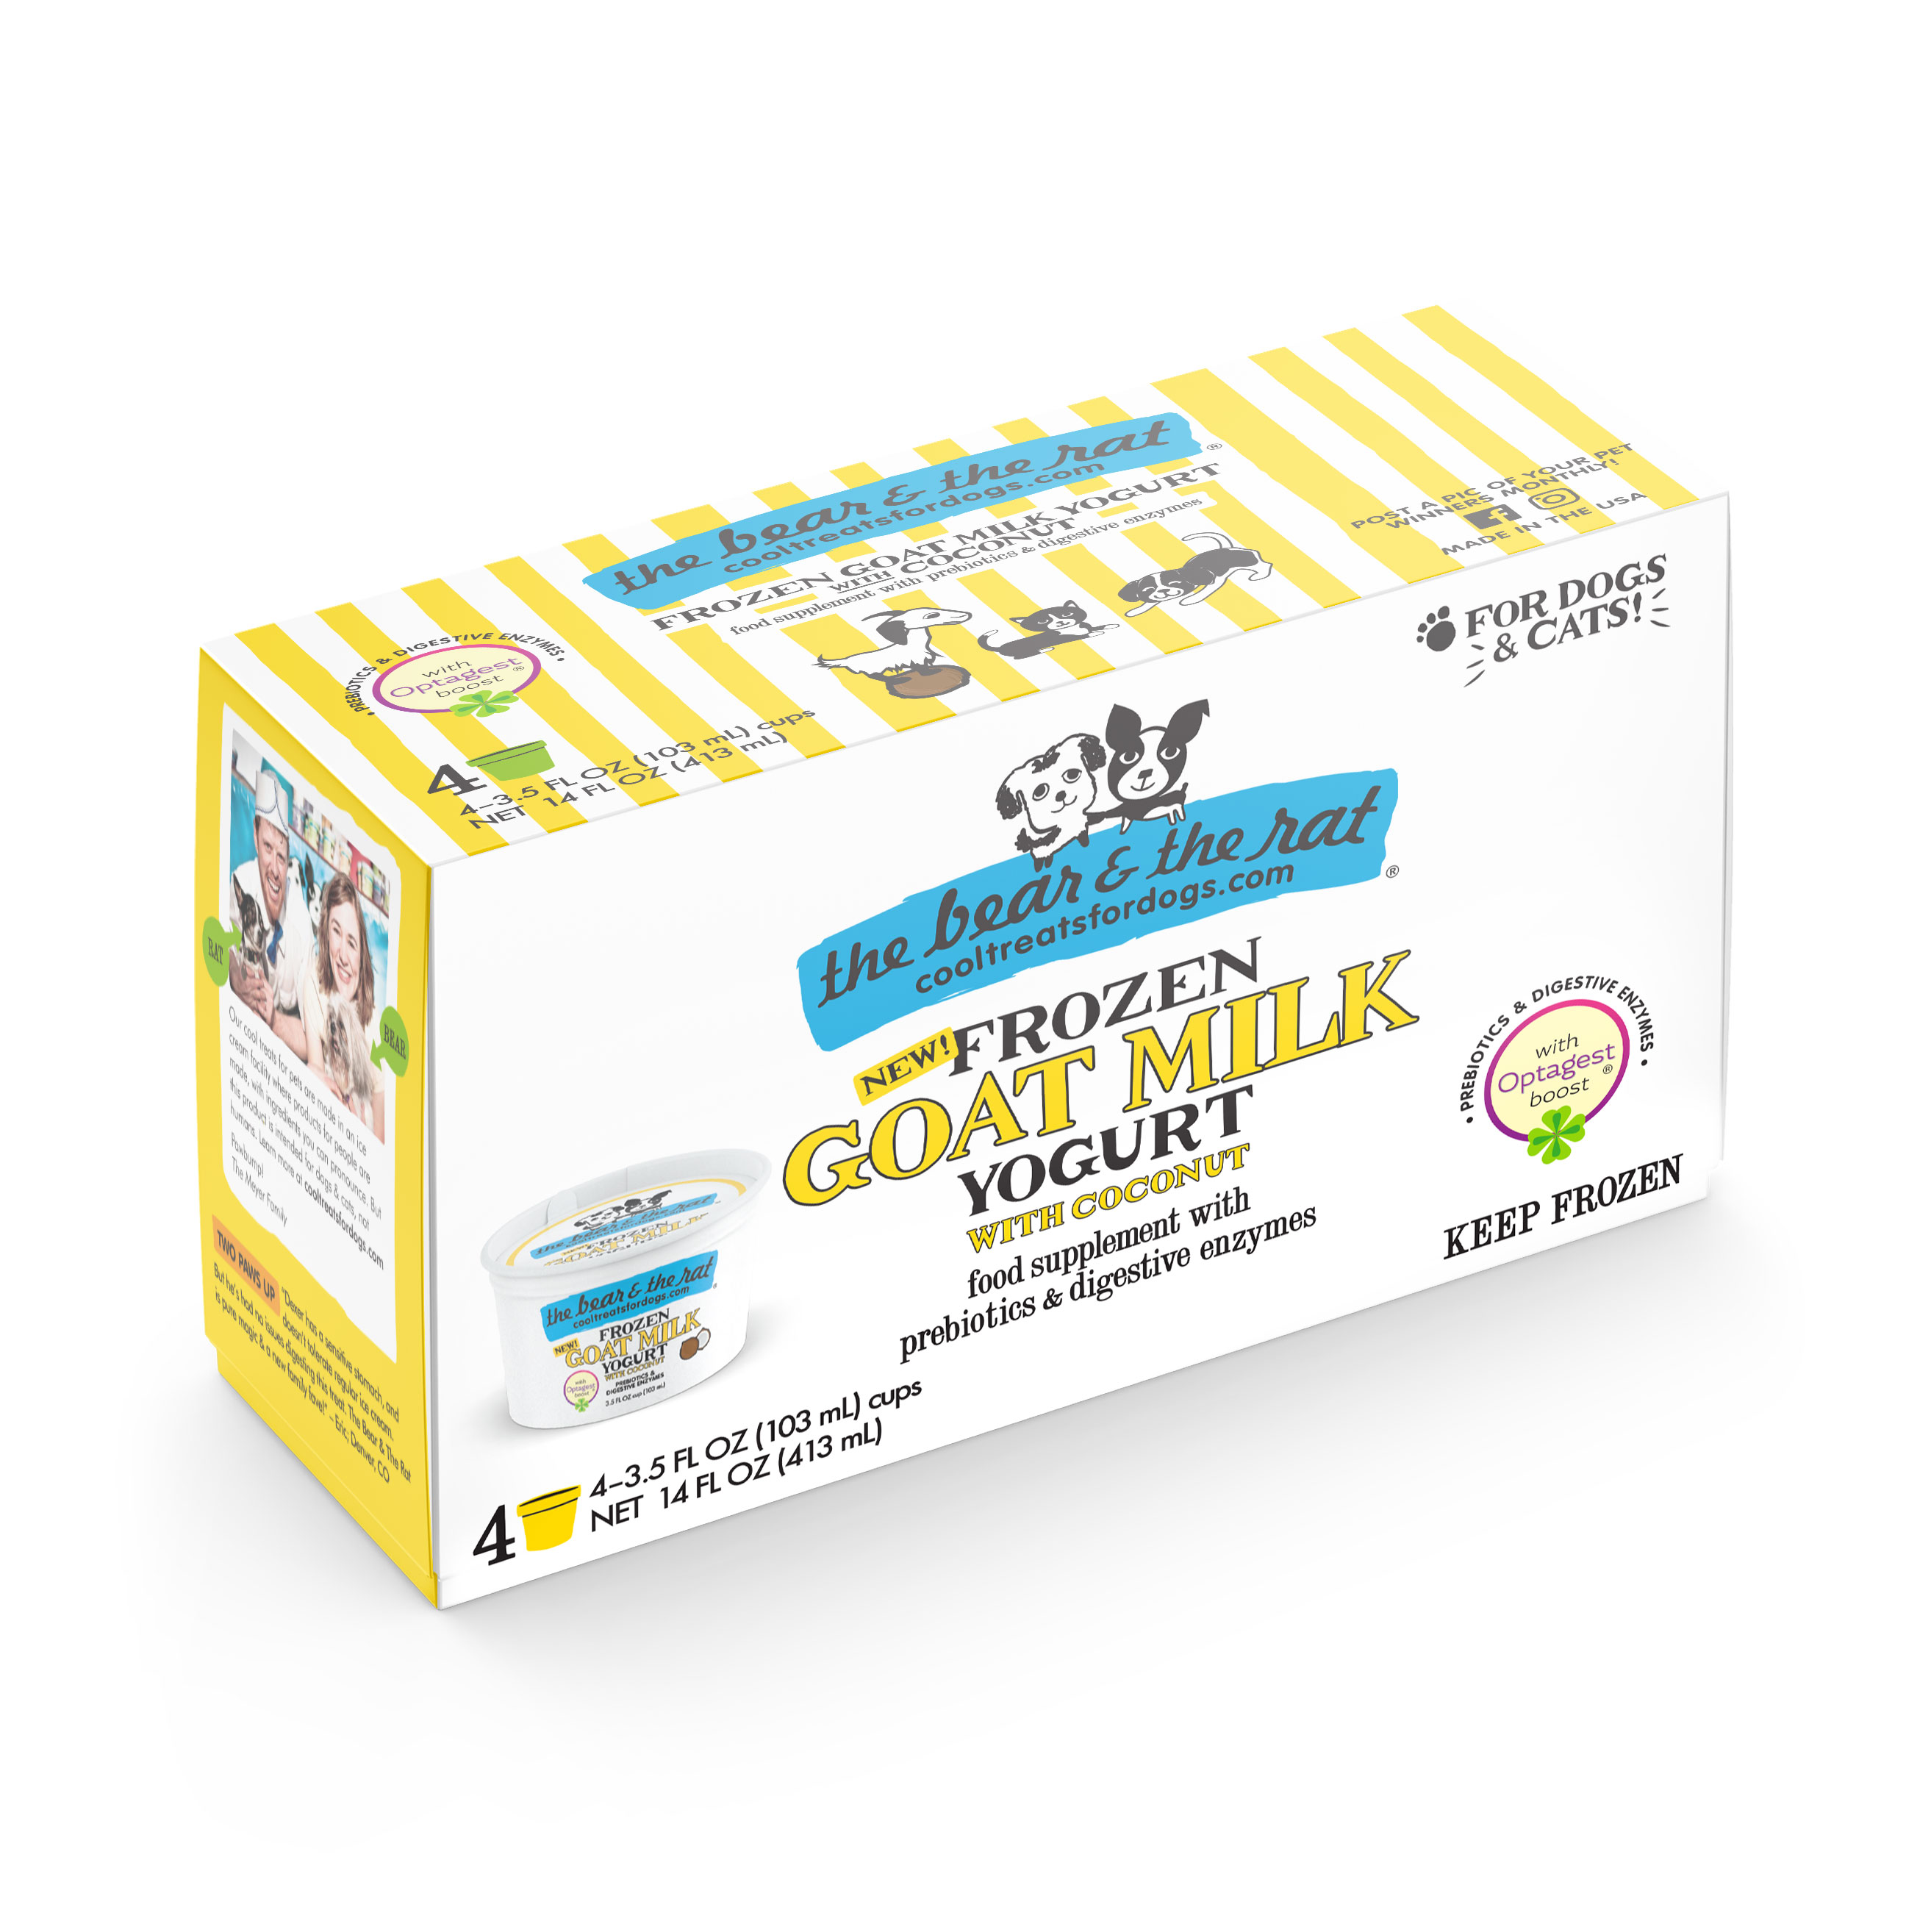 The Bear & The Rat Coconut Frozen Goat Milk Yogurt Dog Treats, 3.5-oz, 4-pack